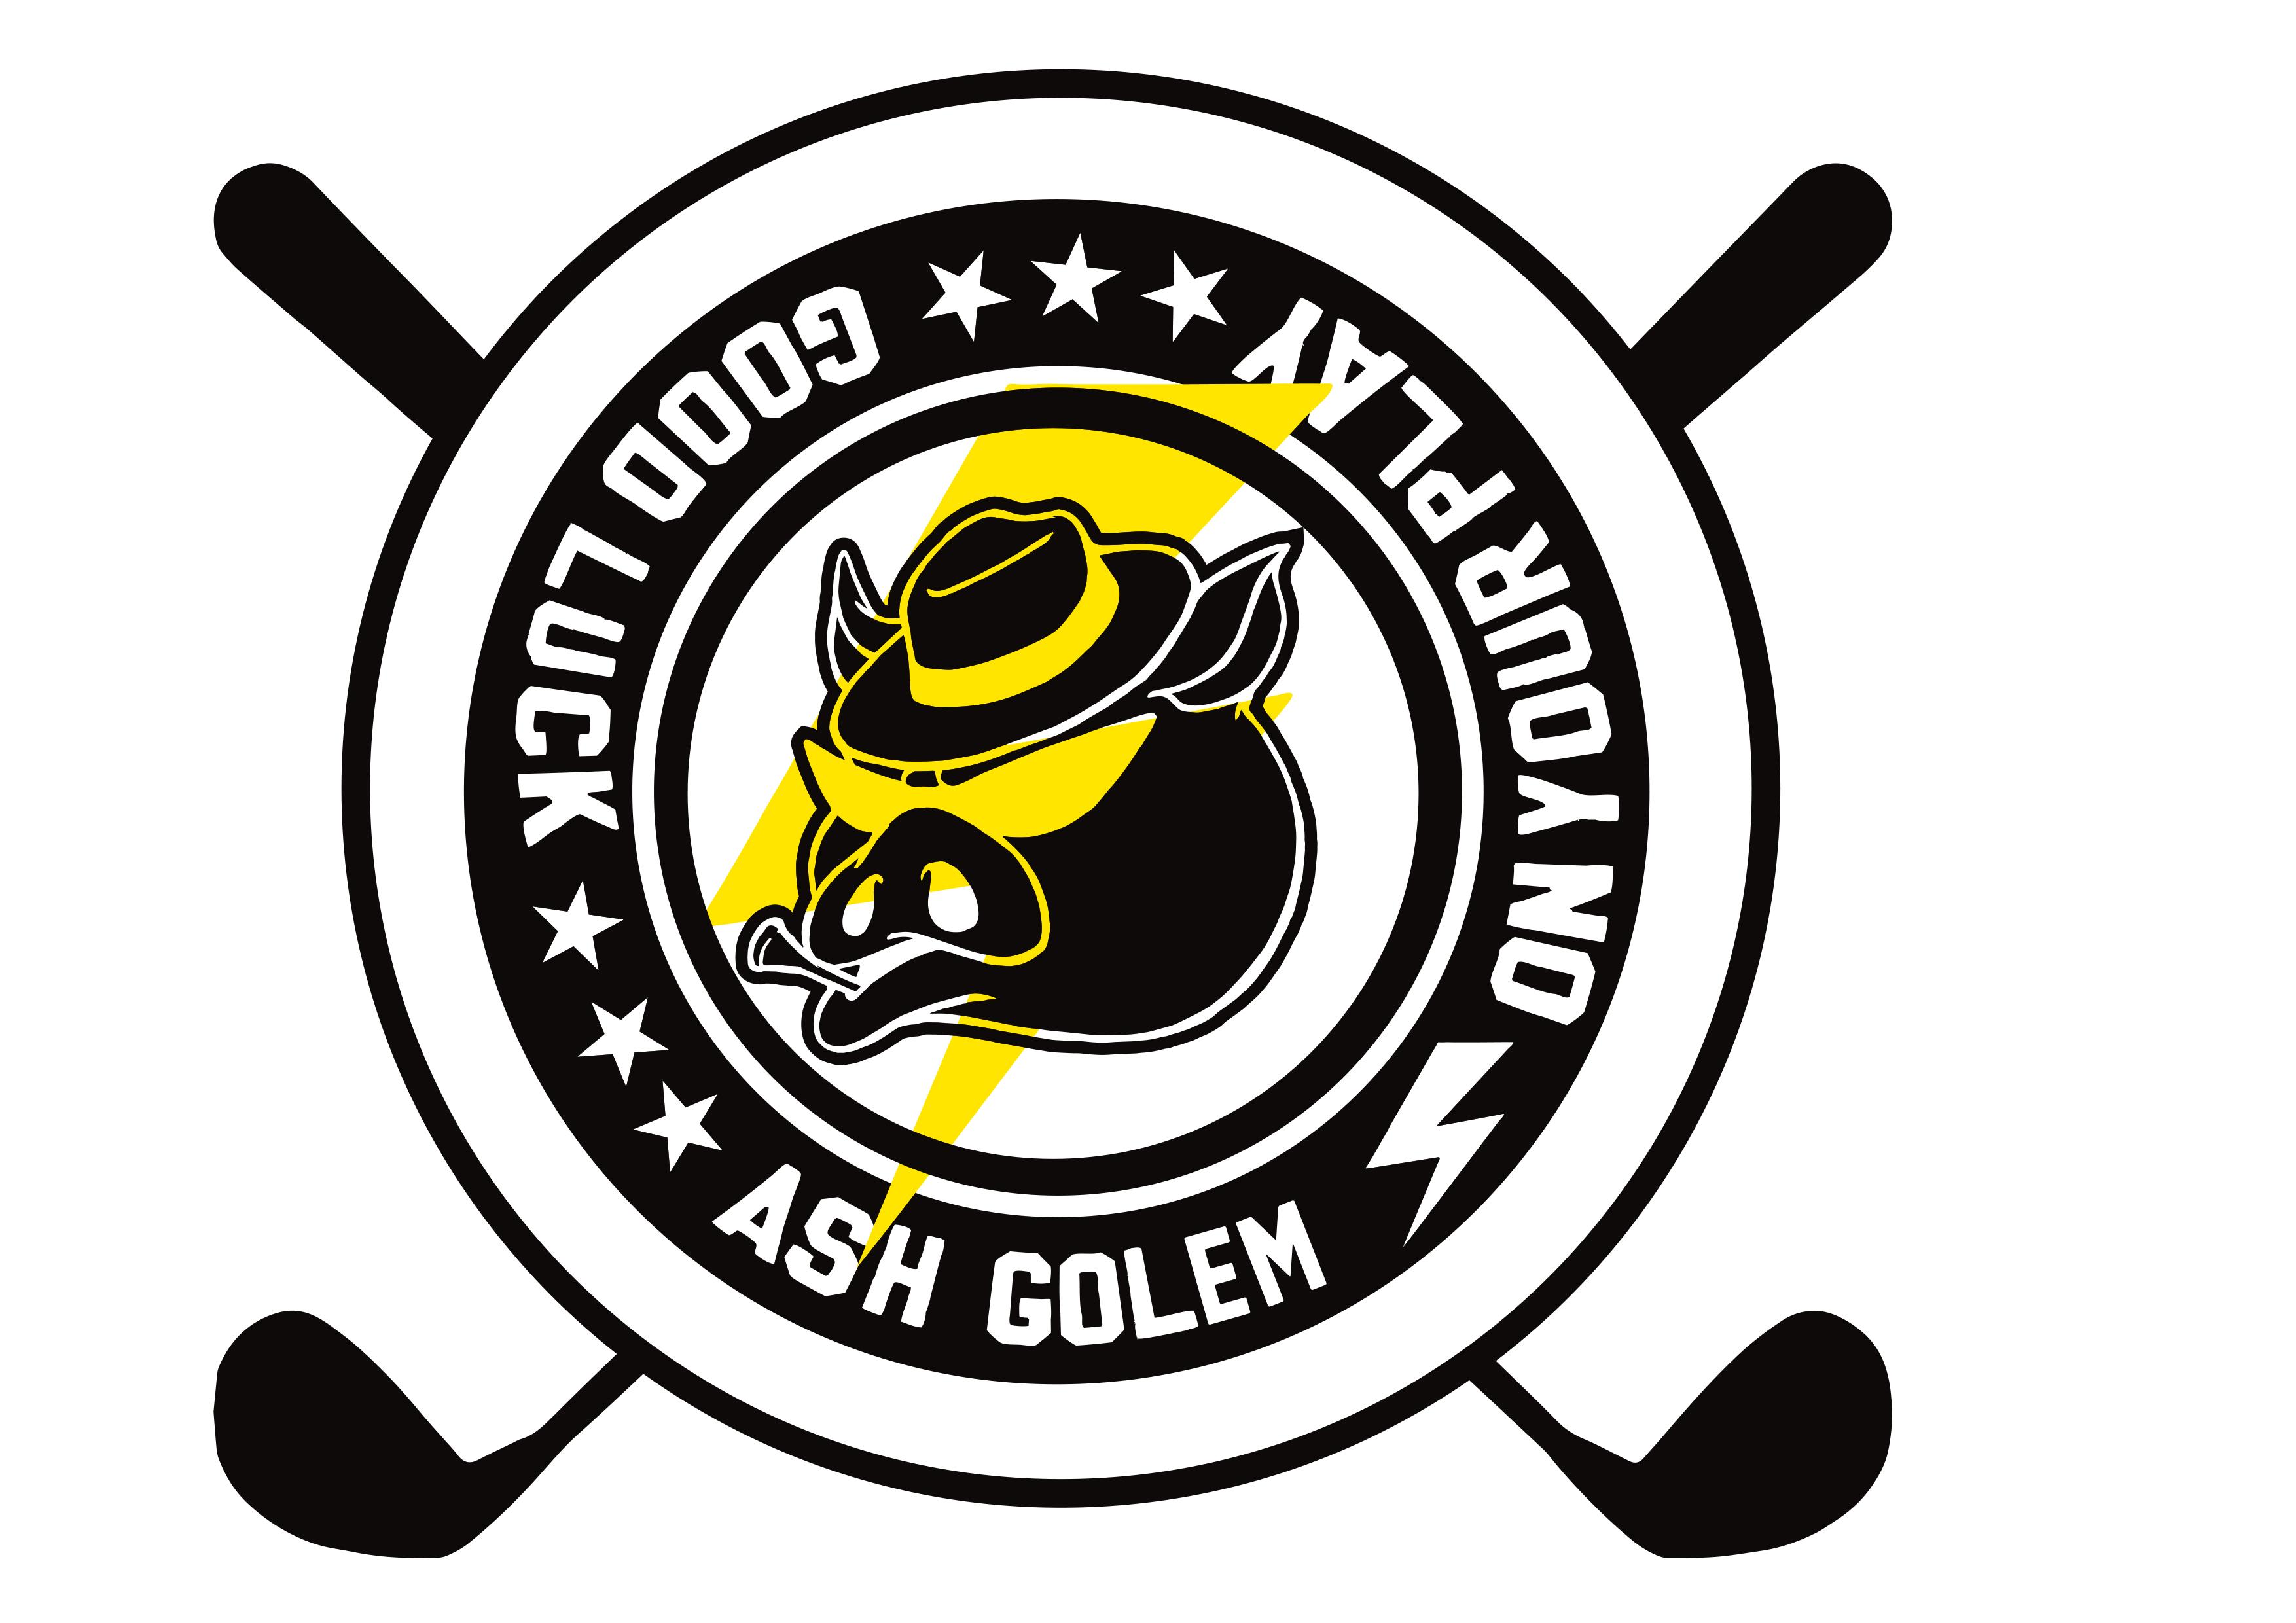 ASH-GOLEM